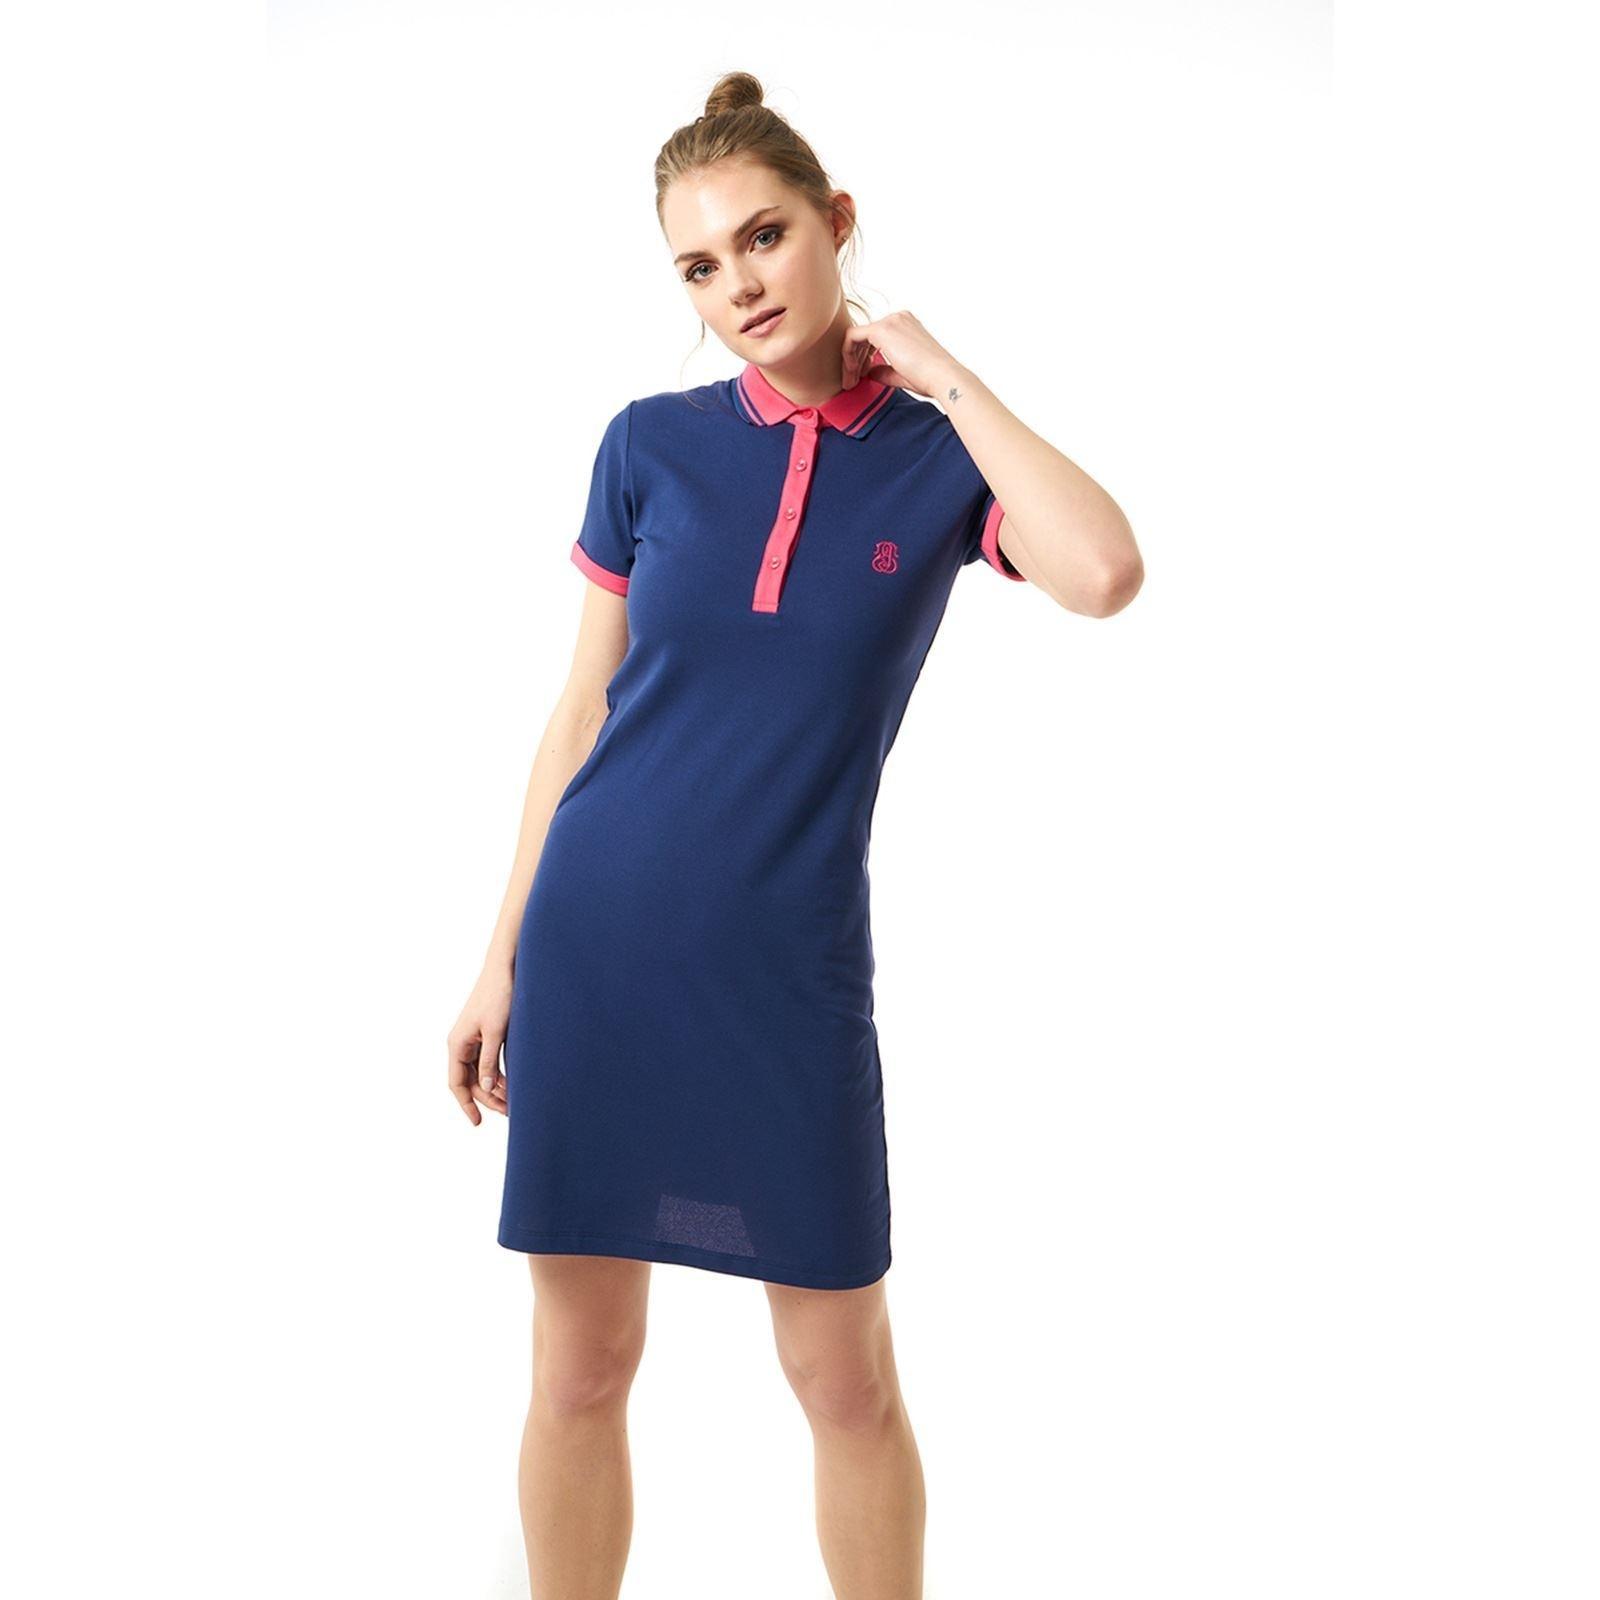 13 Top Kleid Marineblau Bester PreisFormal Schön Kleid Marineblau Vertrieb